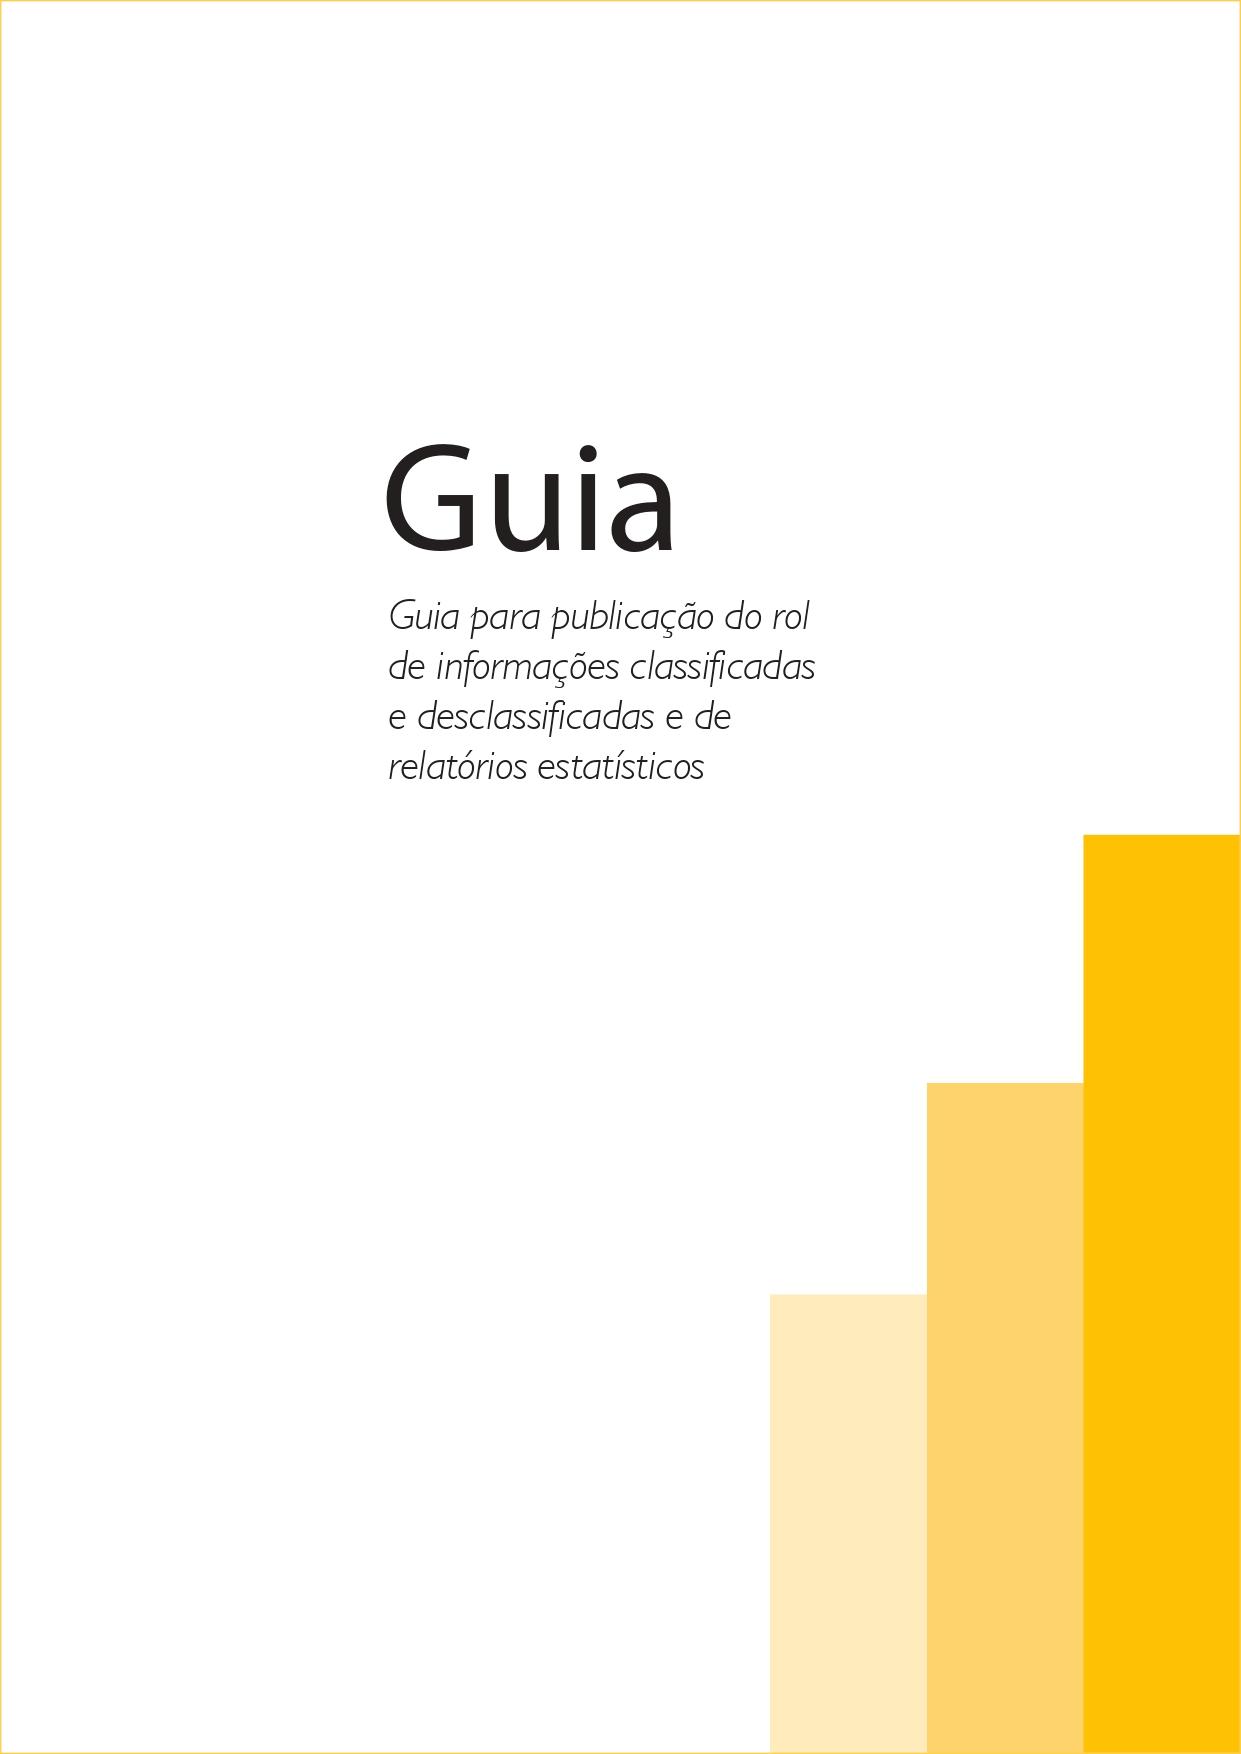 guia-informacoes-classificadas-versao-3.jpg